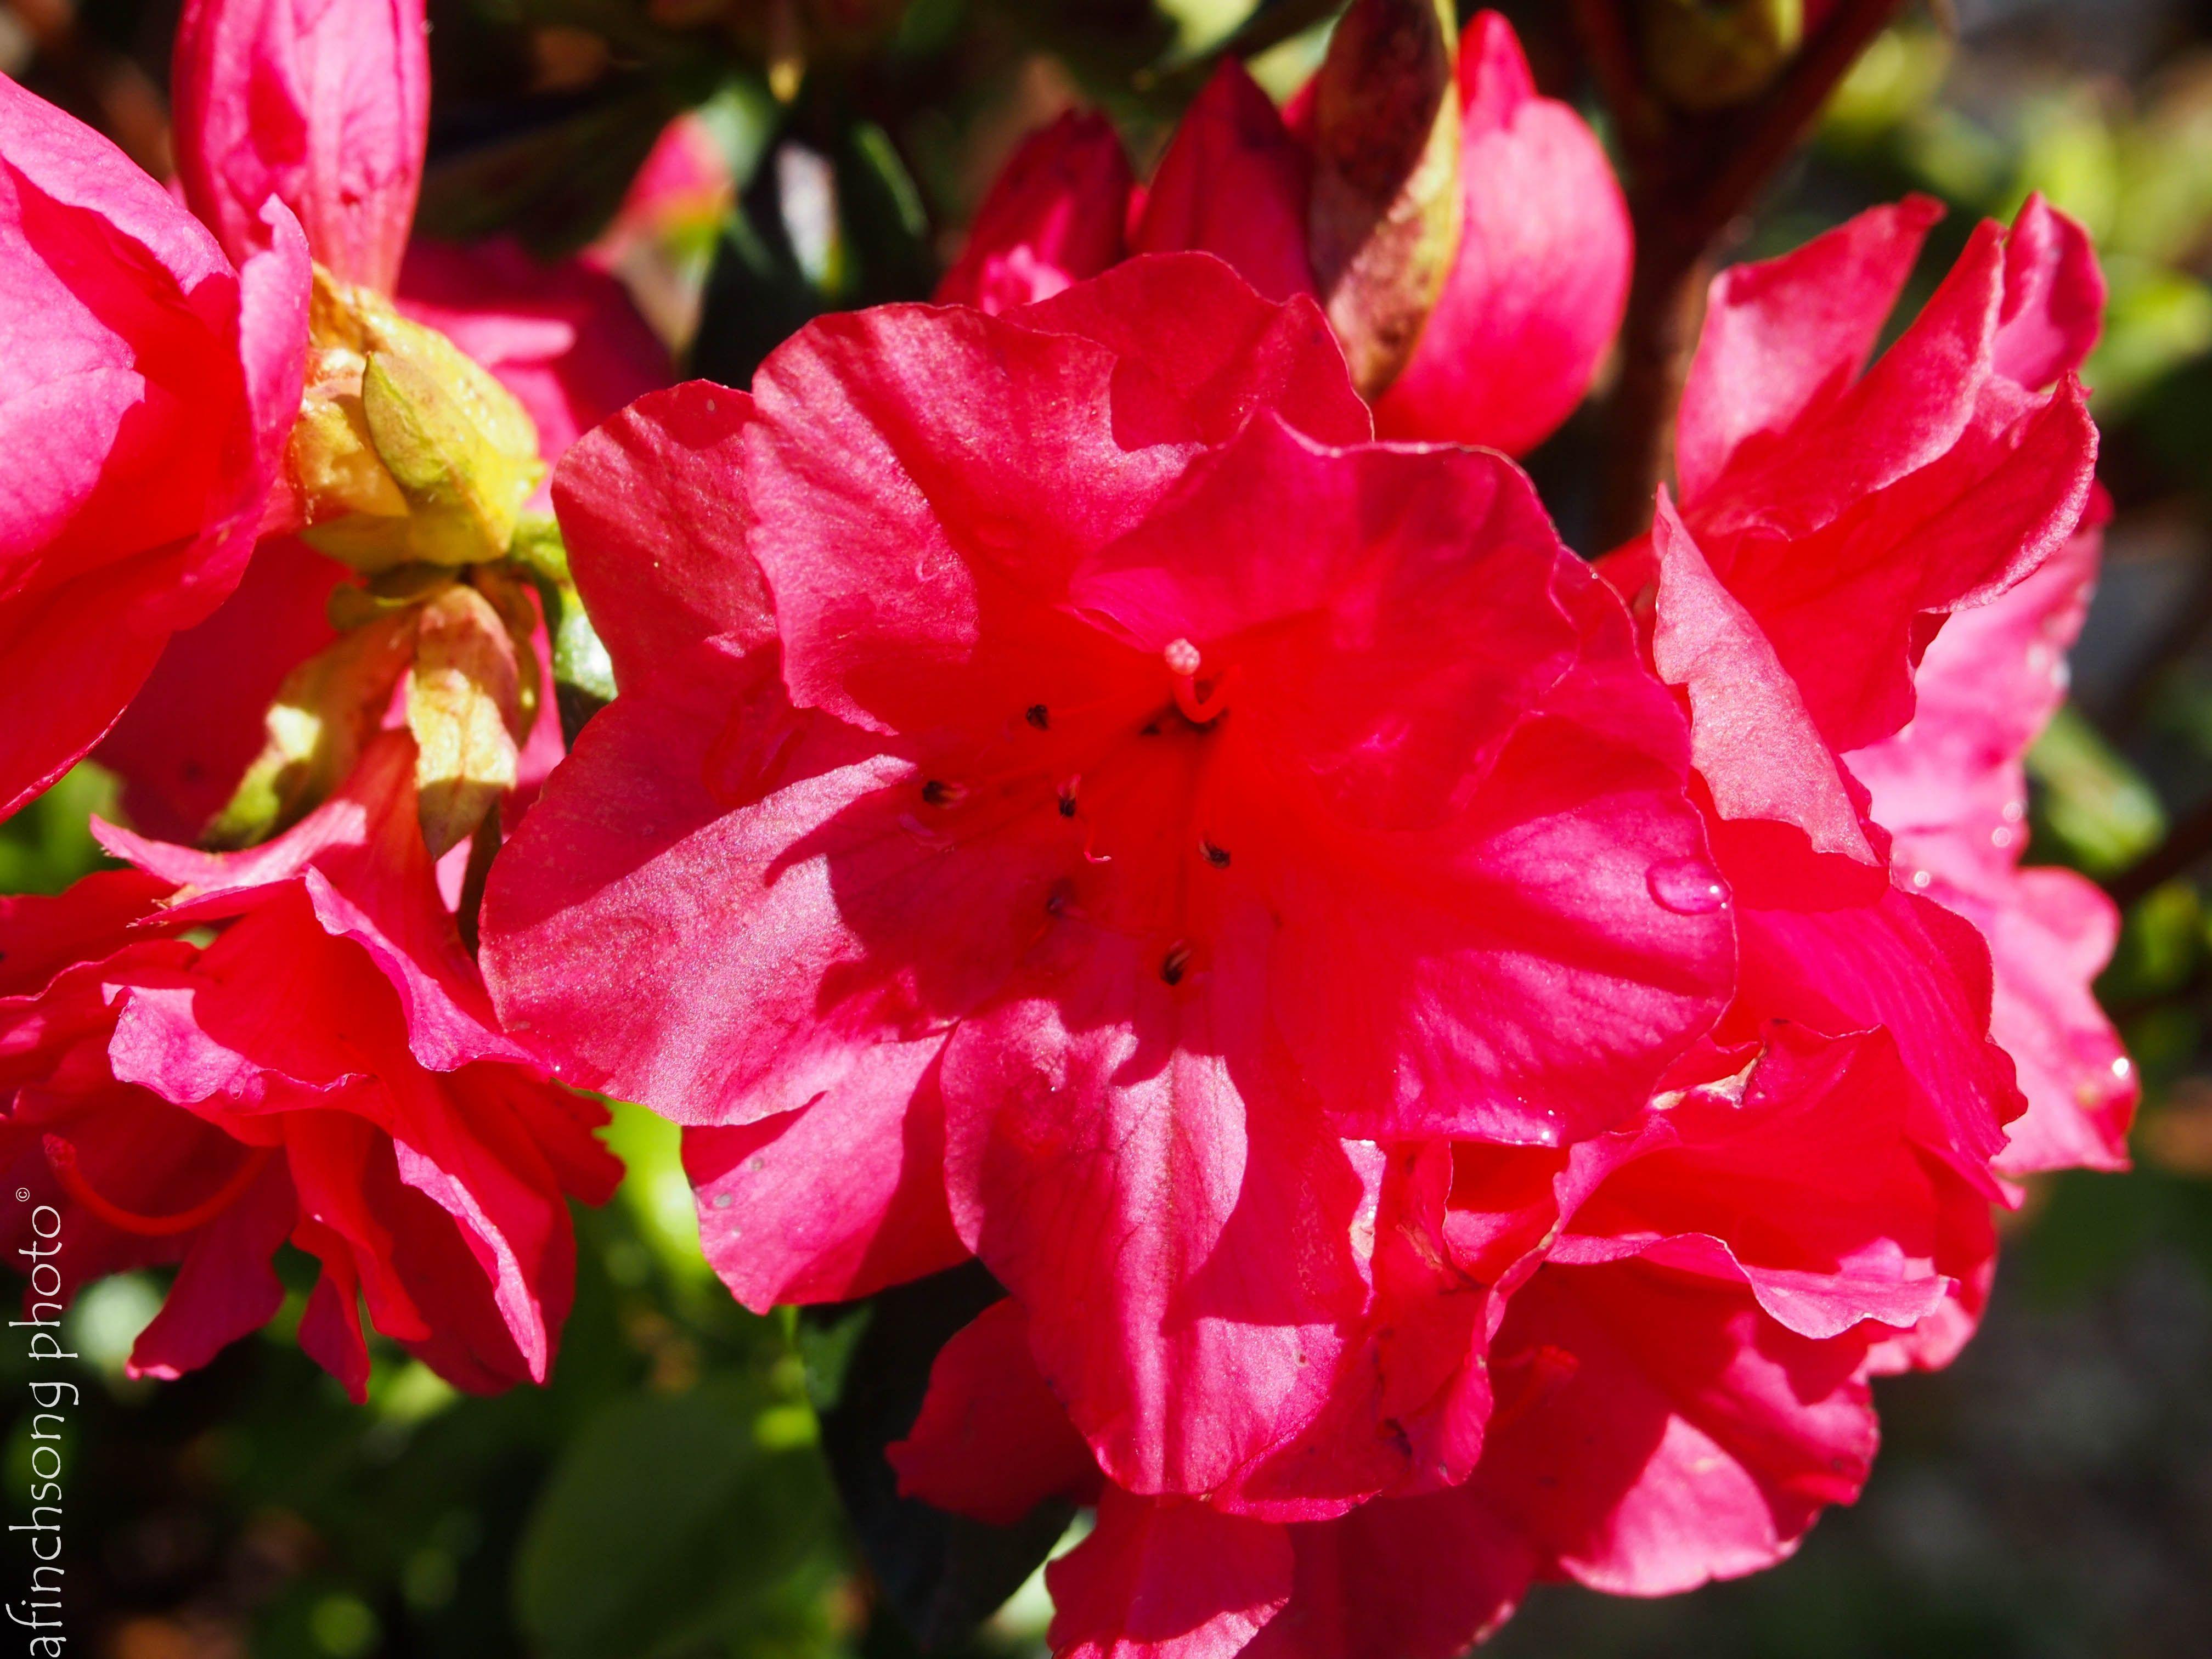 Azalea Kurume Hershey S Red Hershey Red Azalea Flowering Evergreen Shrub Part Sun Size In 10 Years 3h X5 W Dense Moun Azalea Flower Evergreen Shrubs Azaleas